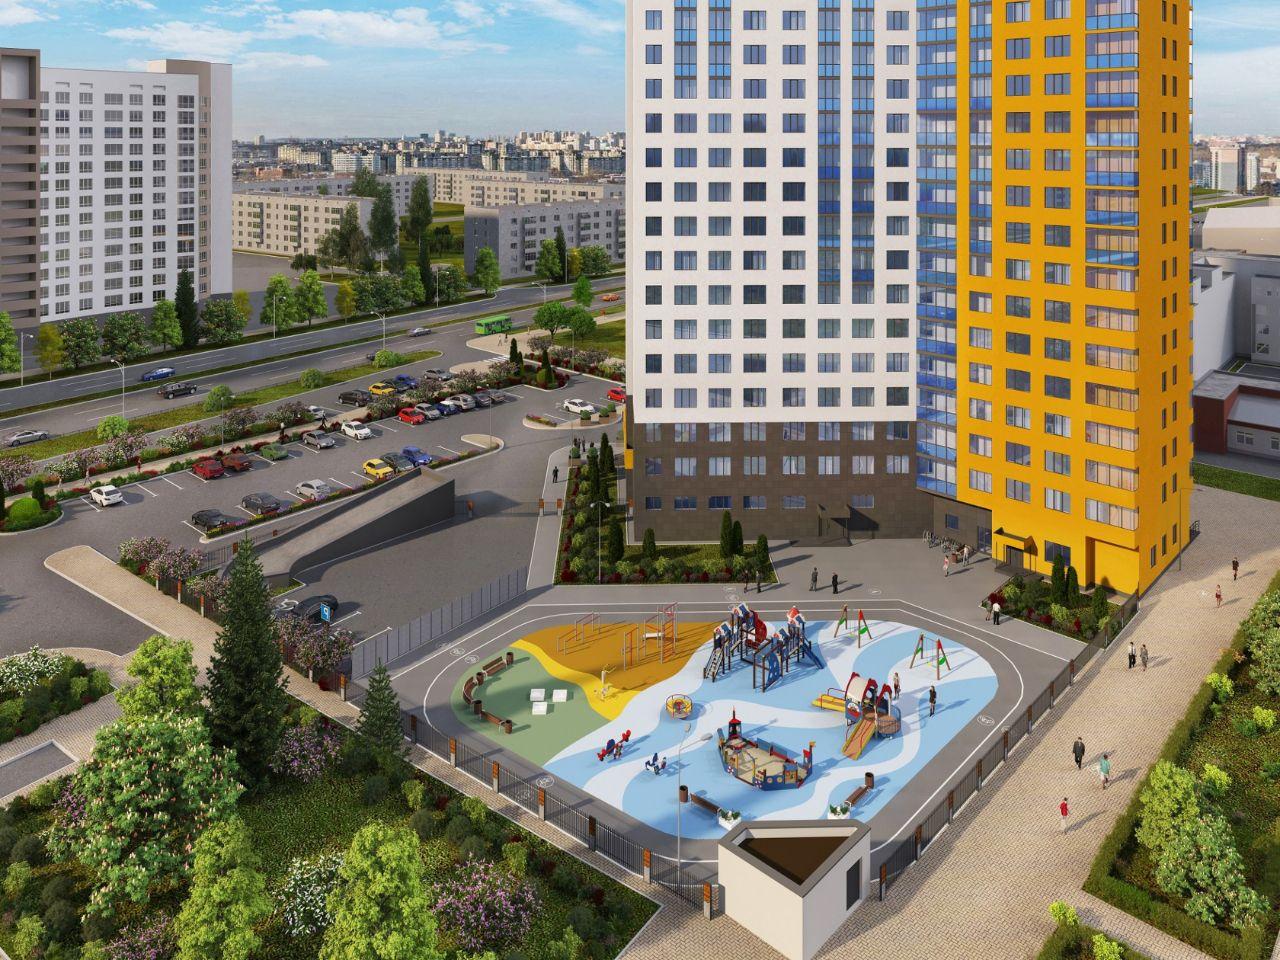 совкомбанк кредитная карта онлайн заявка оформить skip-start.ru